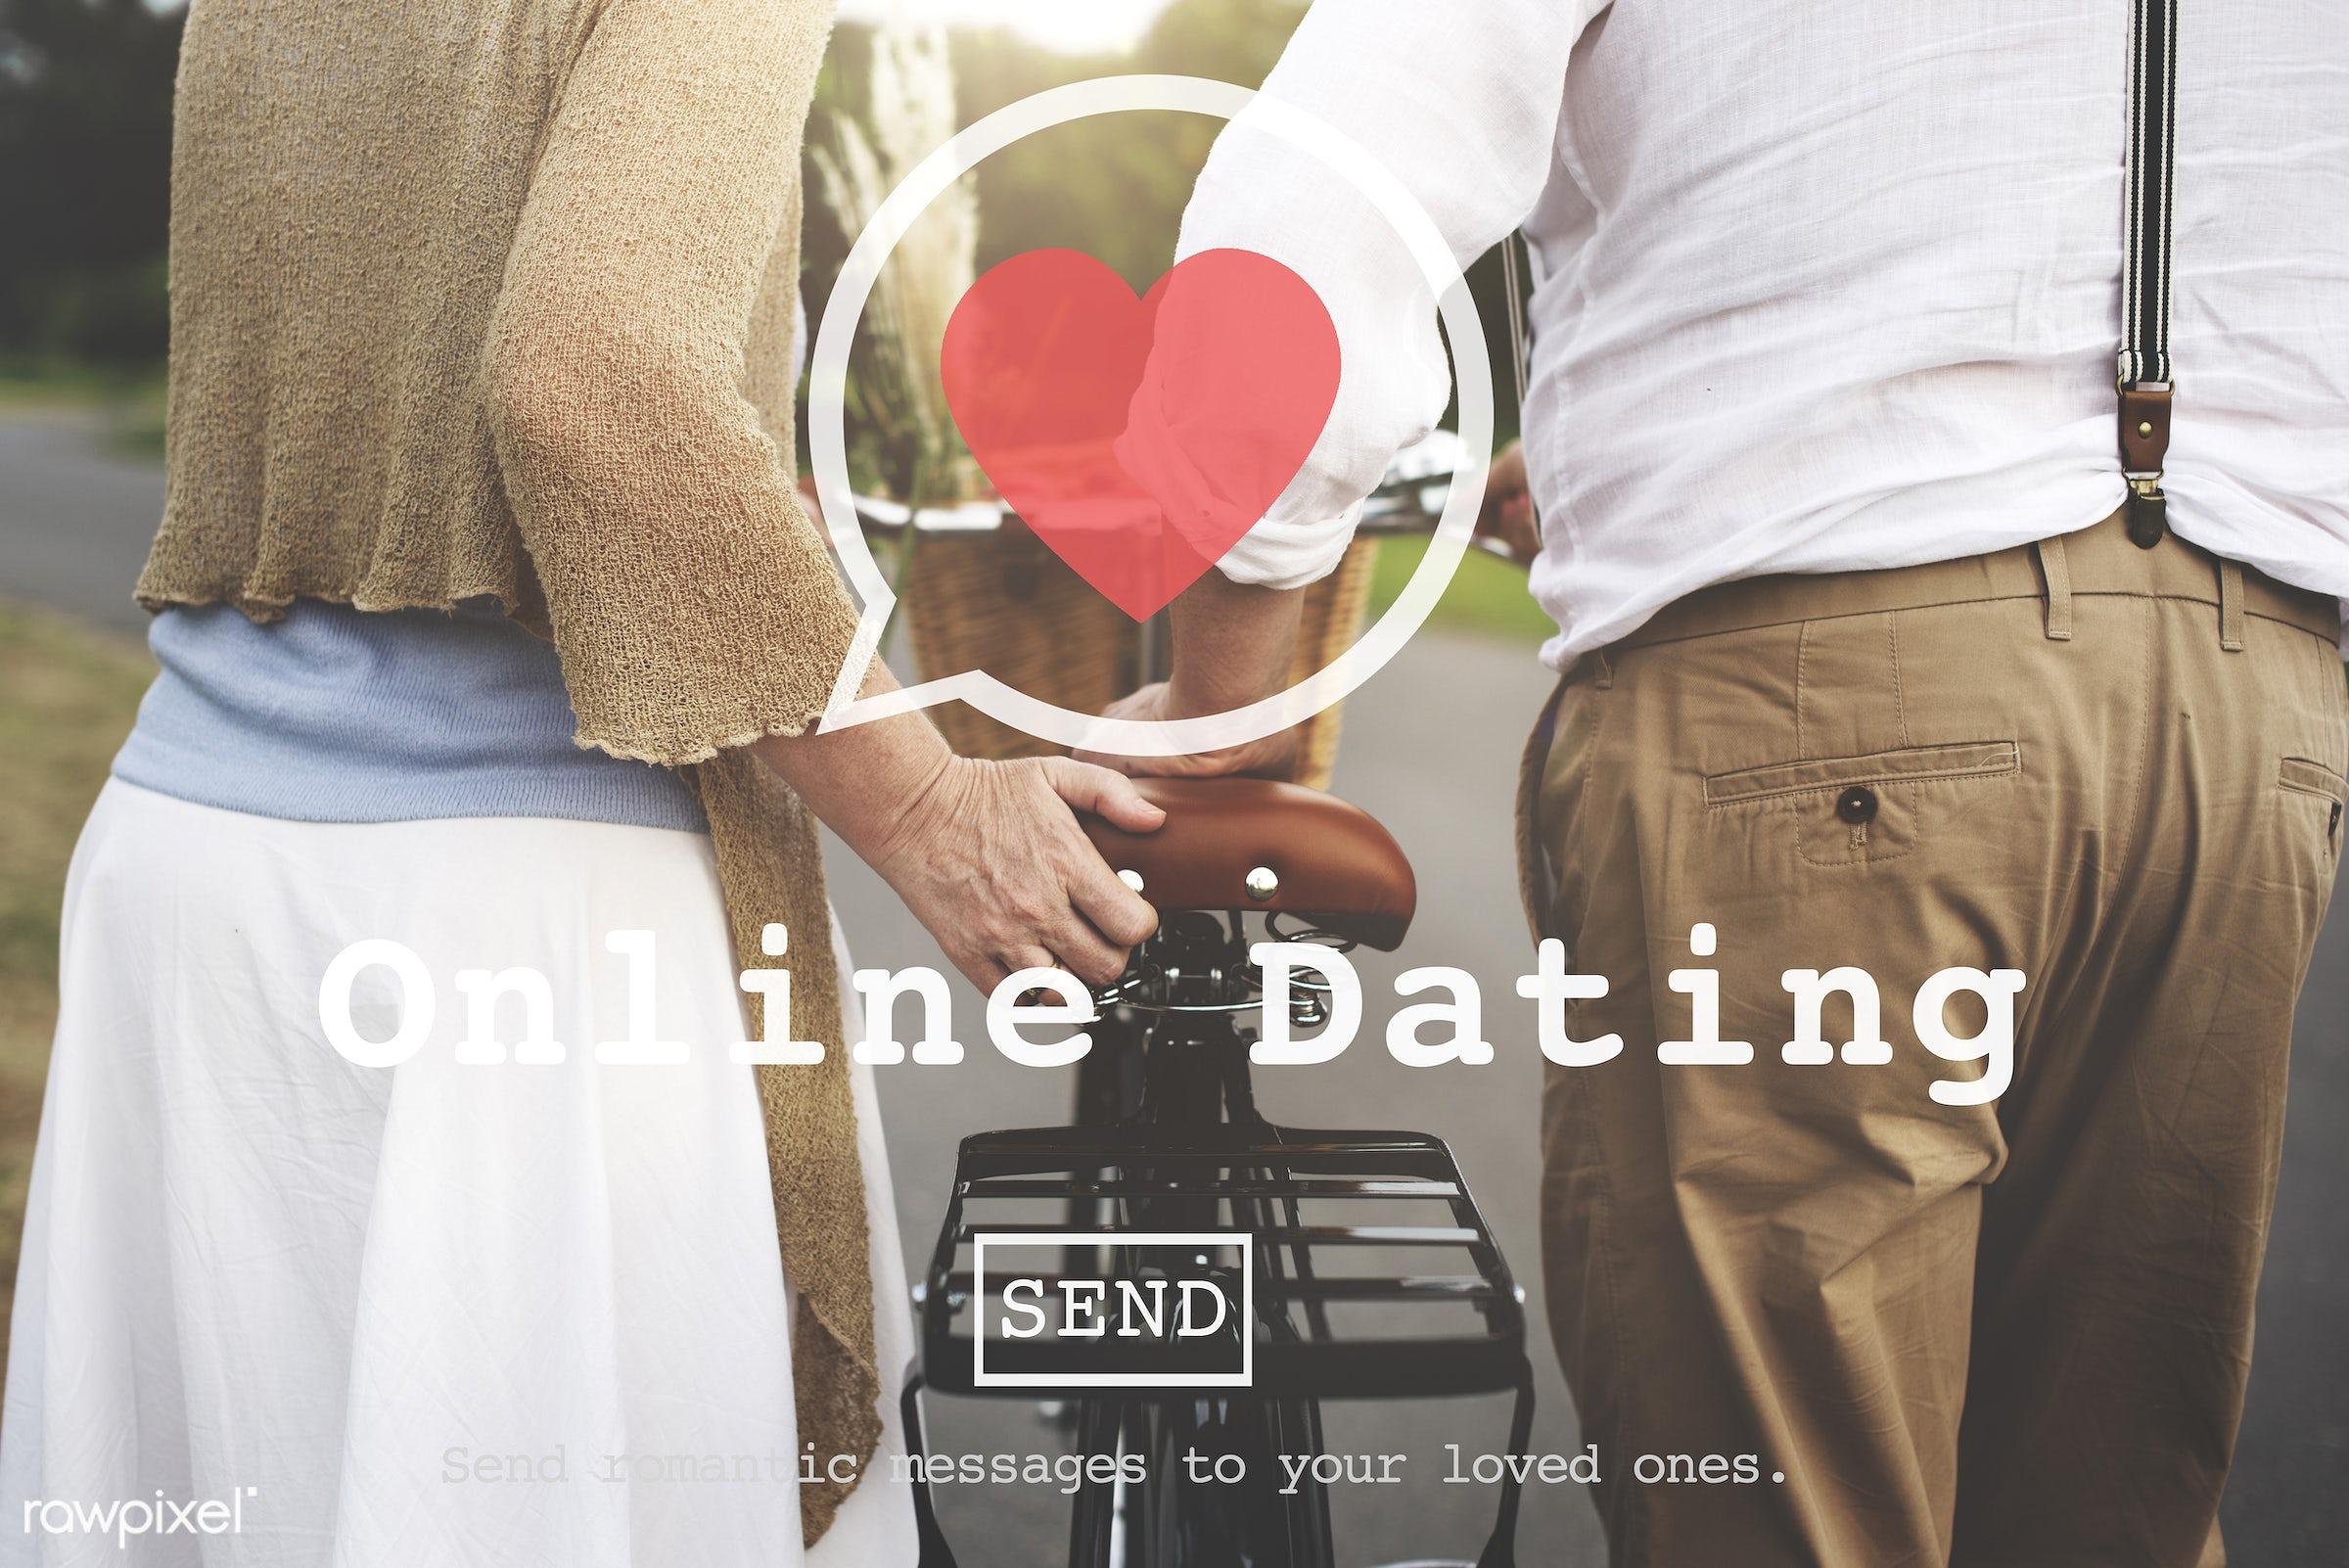 romance, bike, biking, bonding, communication, connect, couple, court, dating, field, go steady, happiness, heart, husband,...